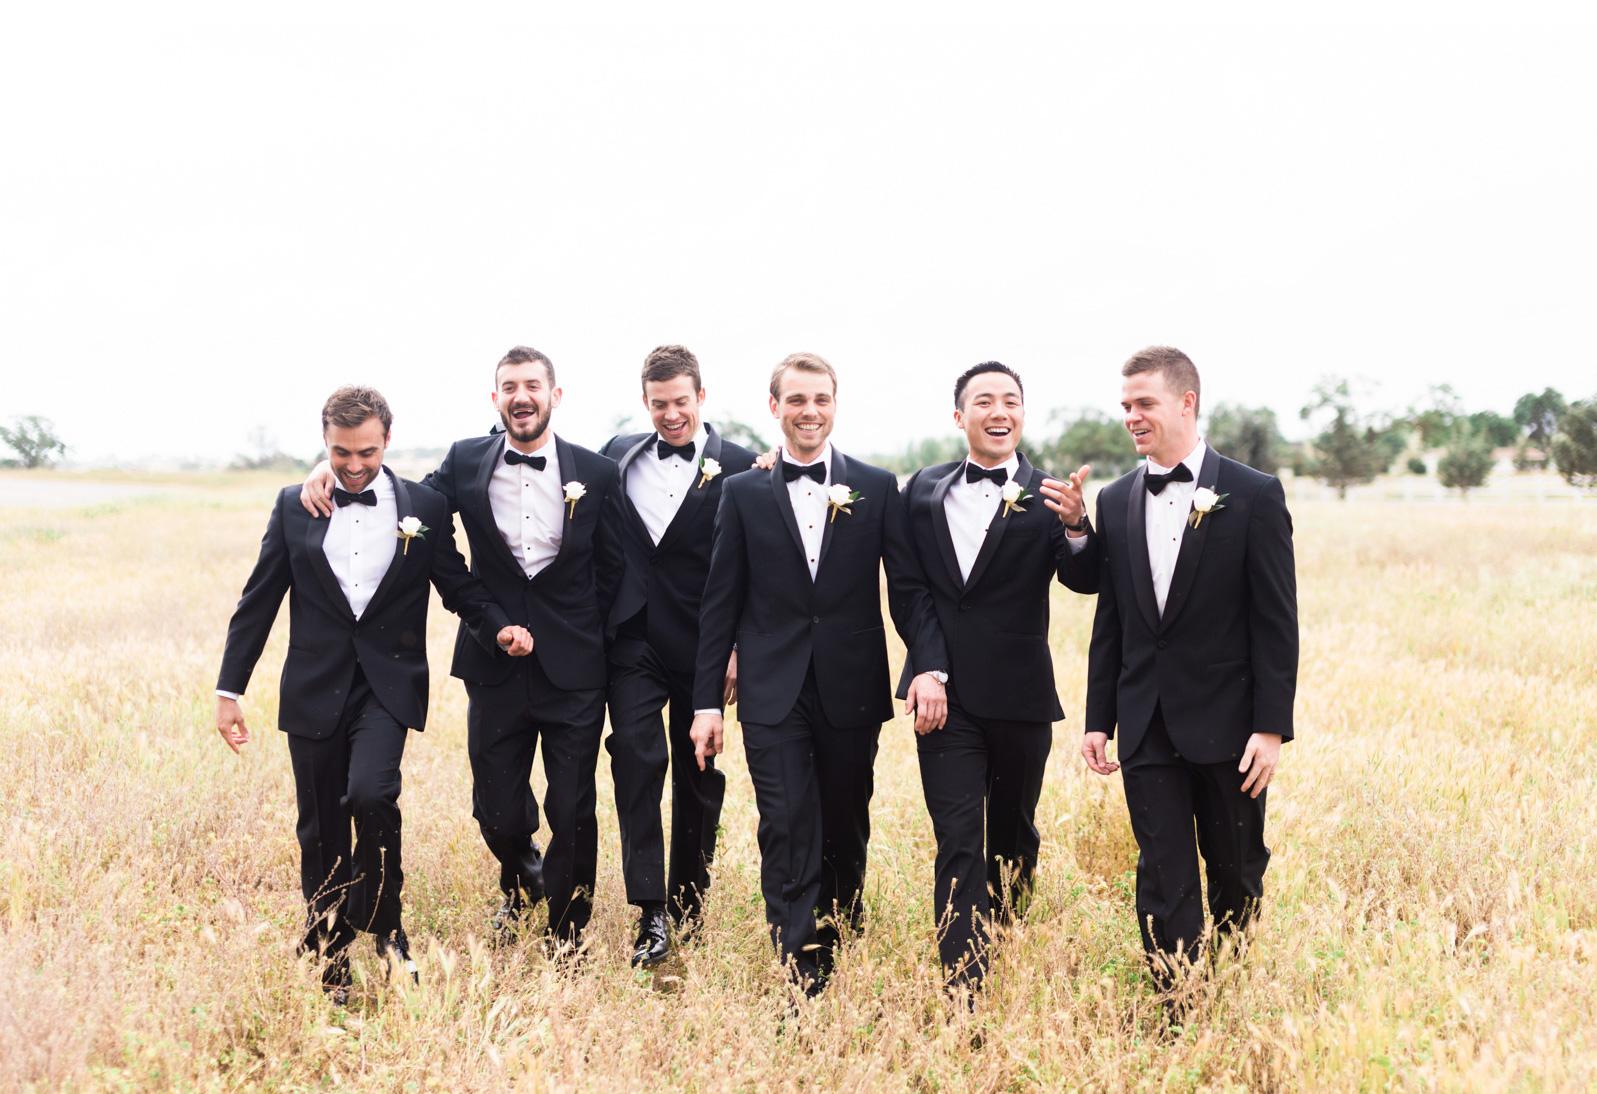 Southern-California-Wedding-Photographer-Natalie-Schutt-Photography_03.jpg